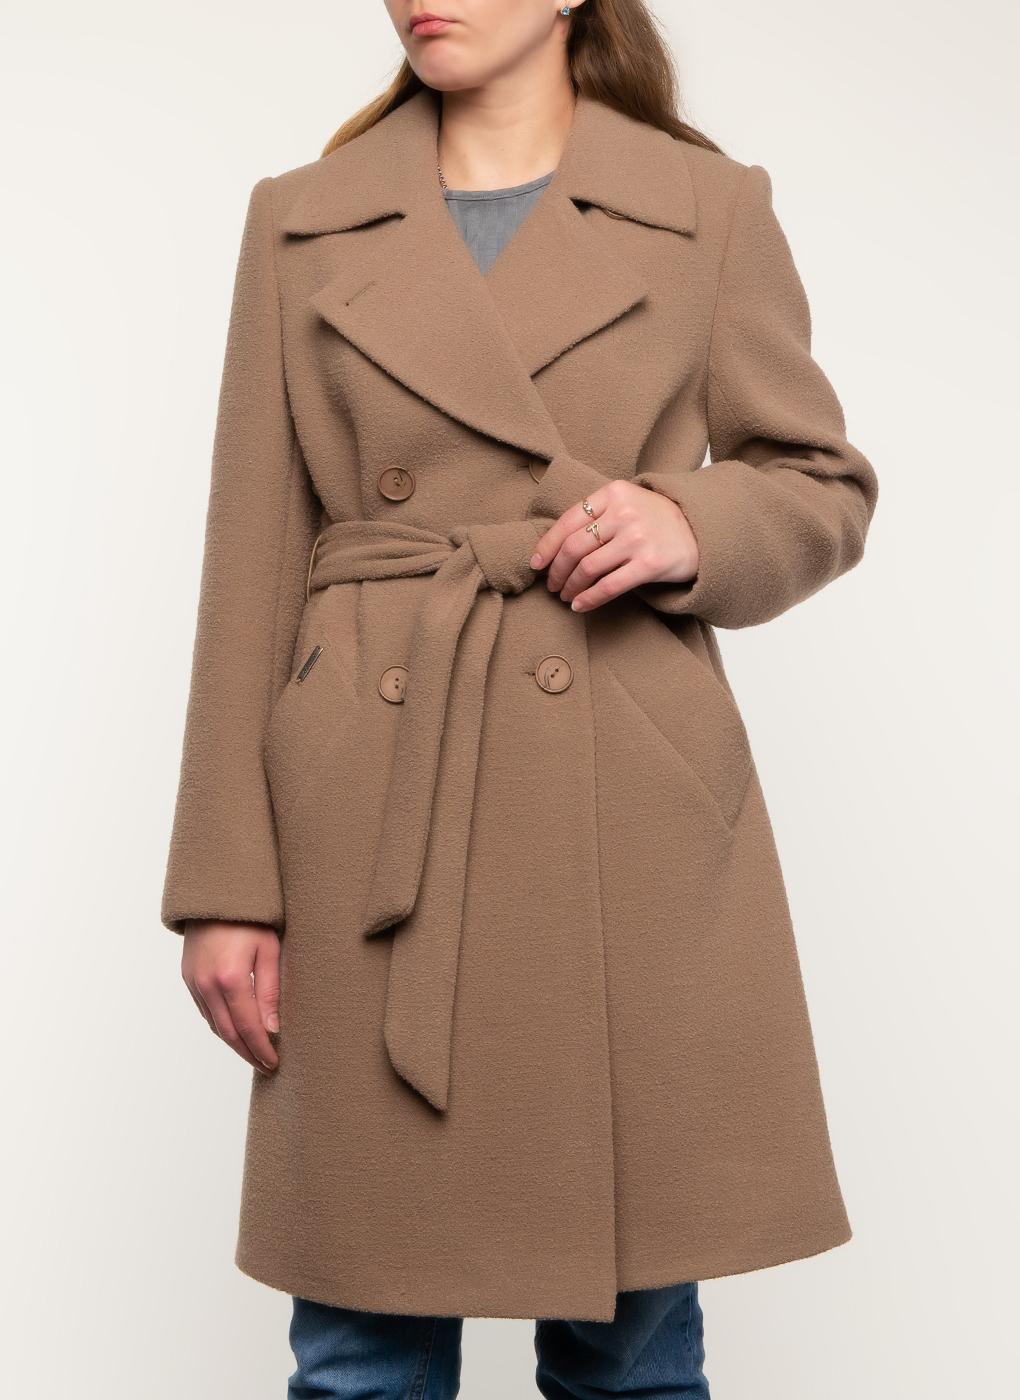 Пальто полушерстяное 75, idekka фото